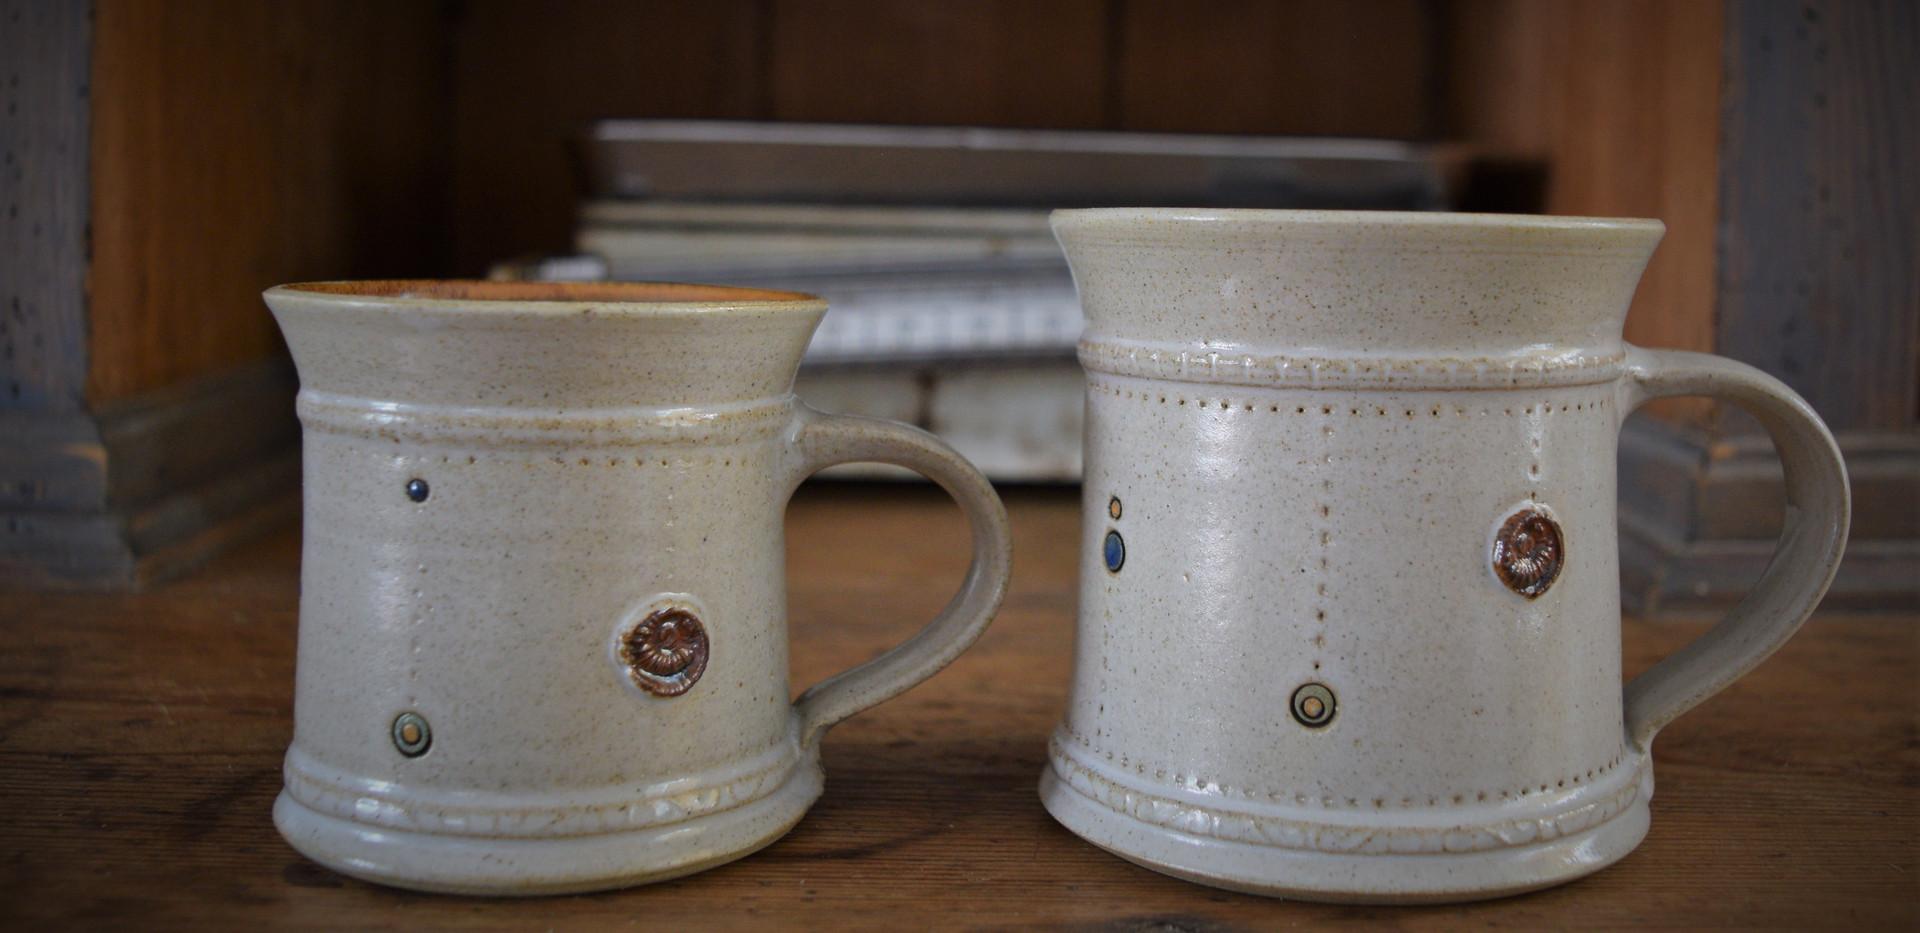 Medium Mug and Straight Mug